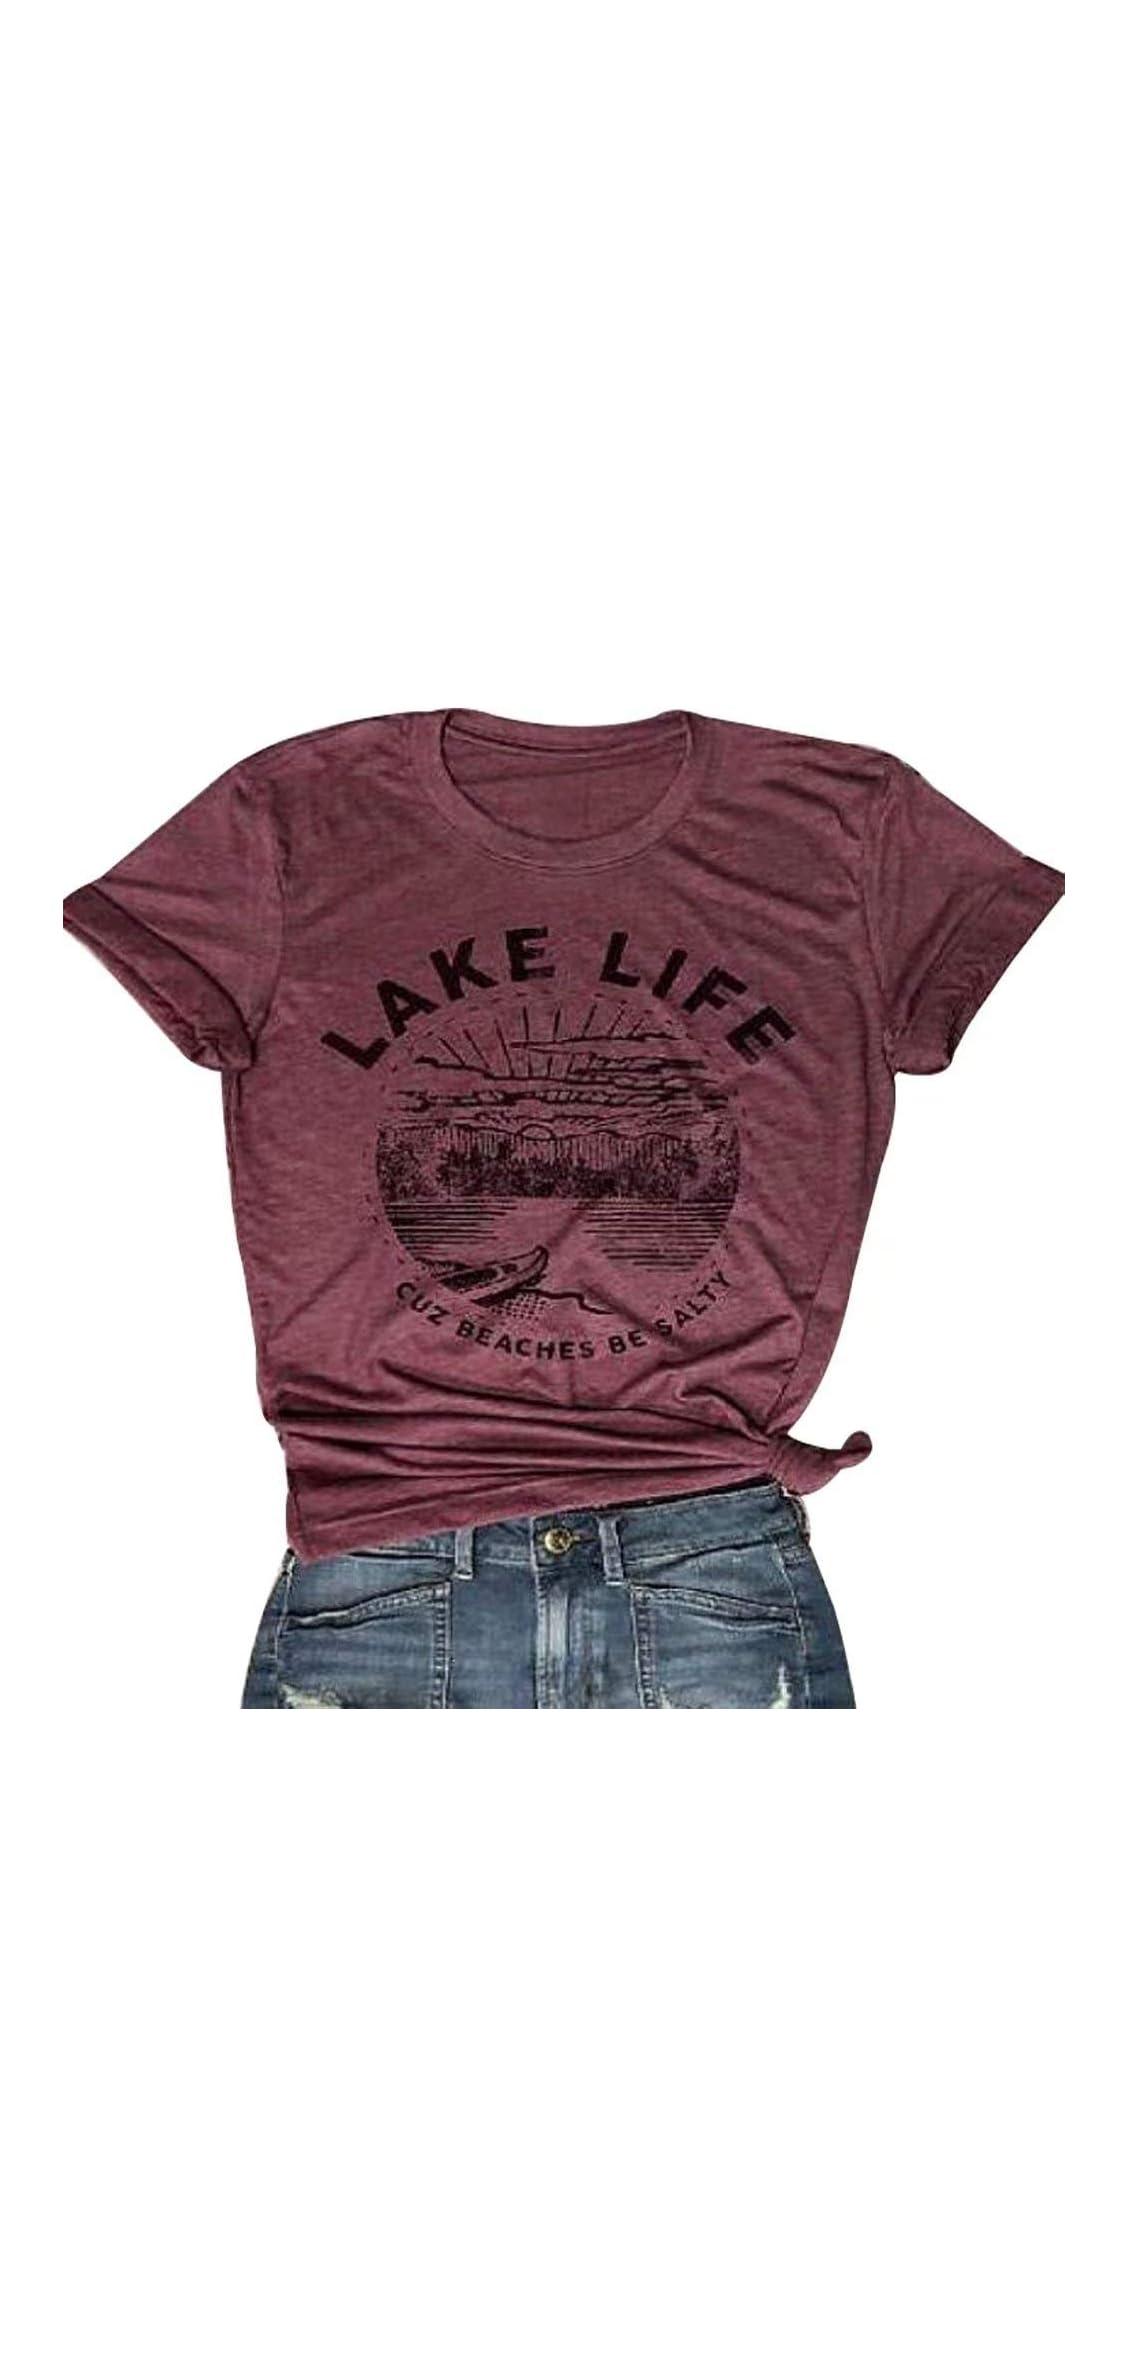 Lake Life T Shirt Women Cute Funny Graphic Tees Casual Short